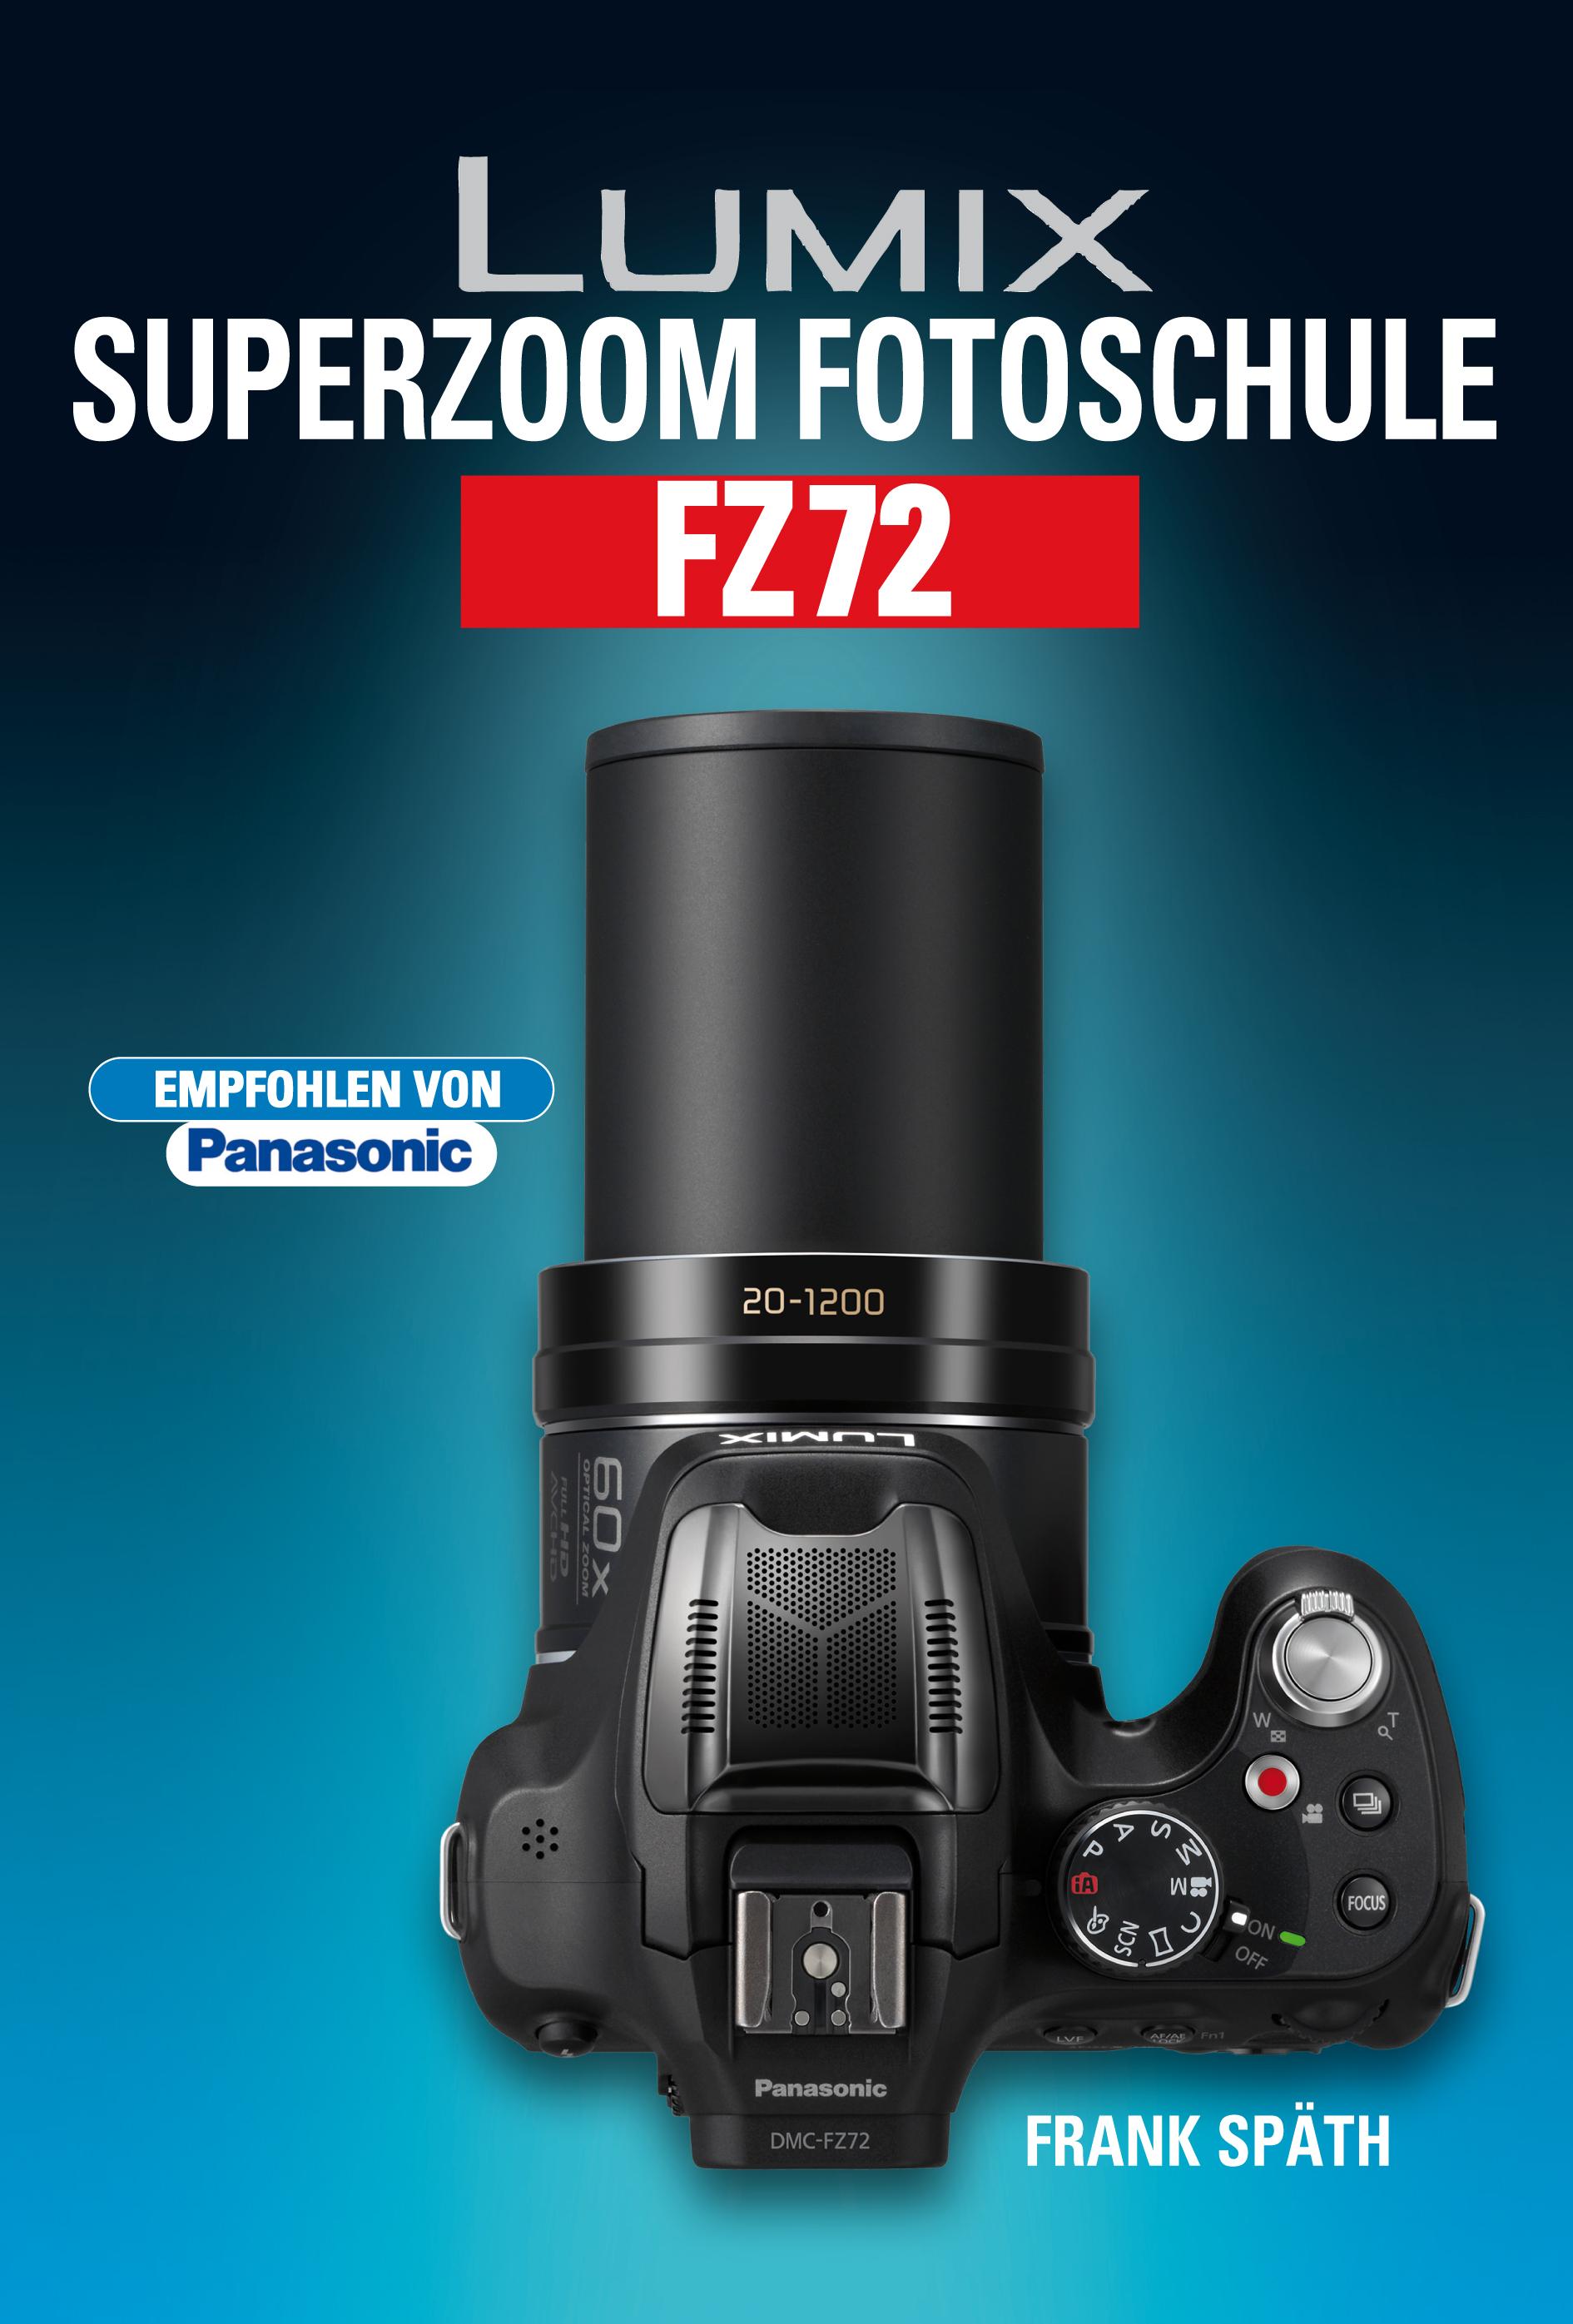 Lumix Superzoom Fotoschule FZ72 - Frank Späth